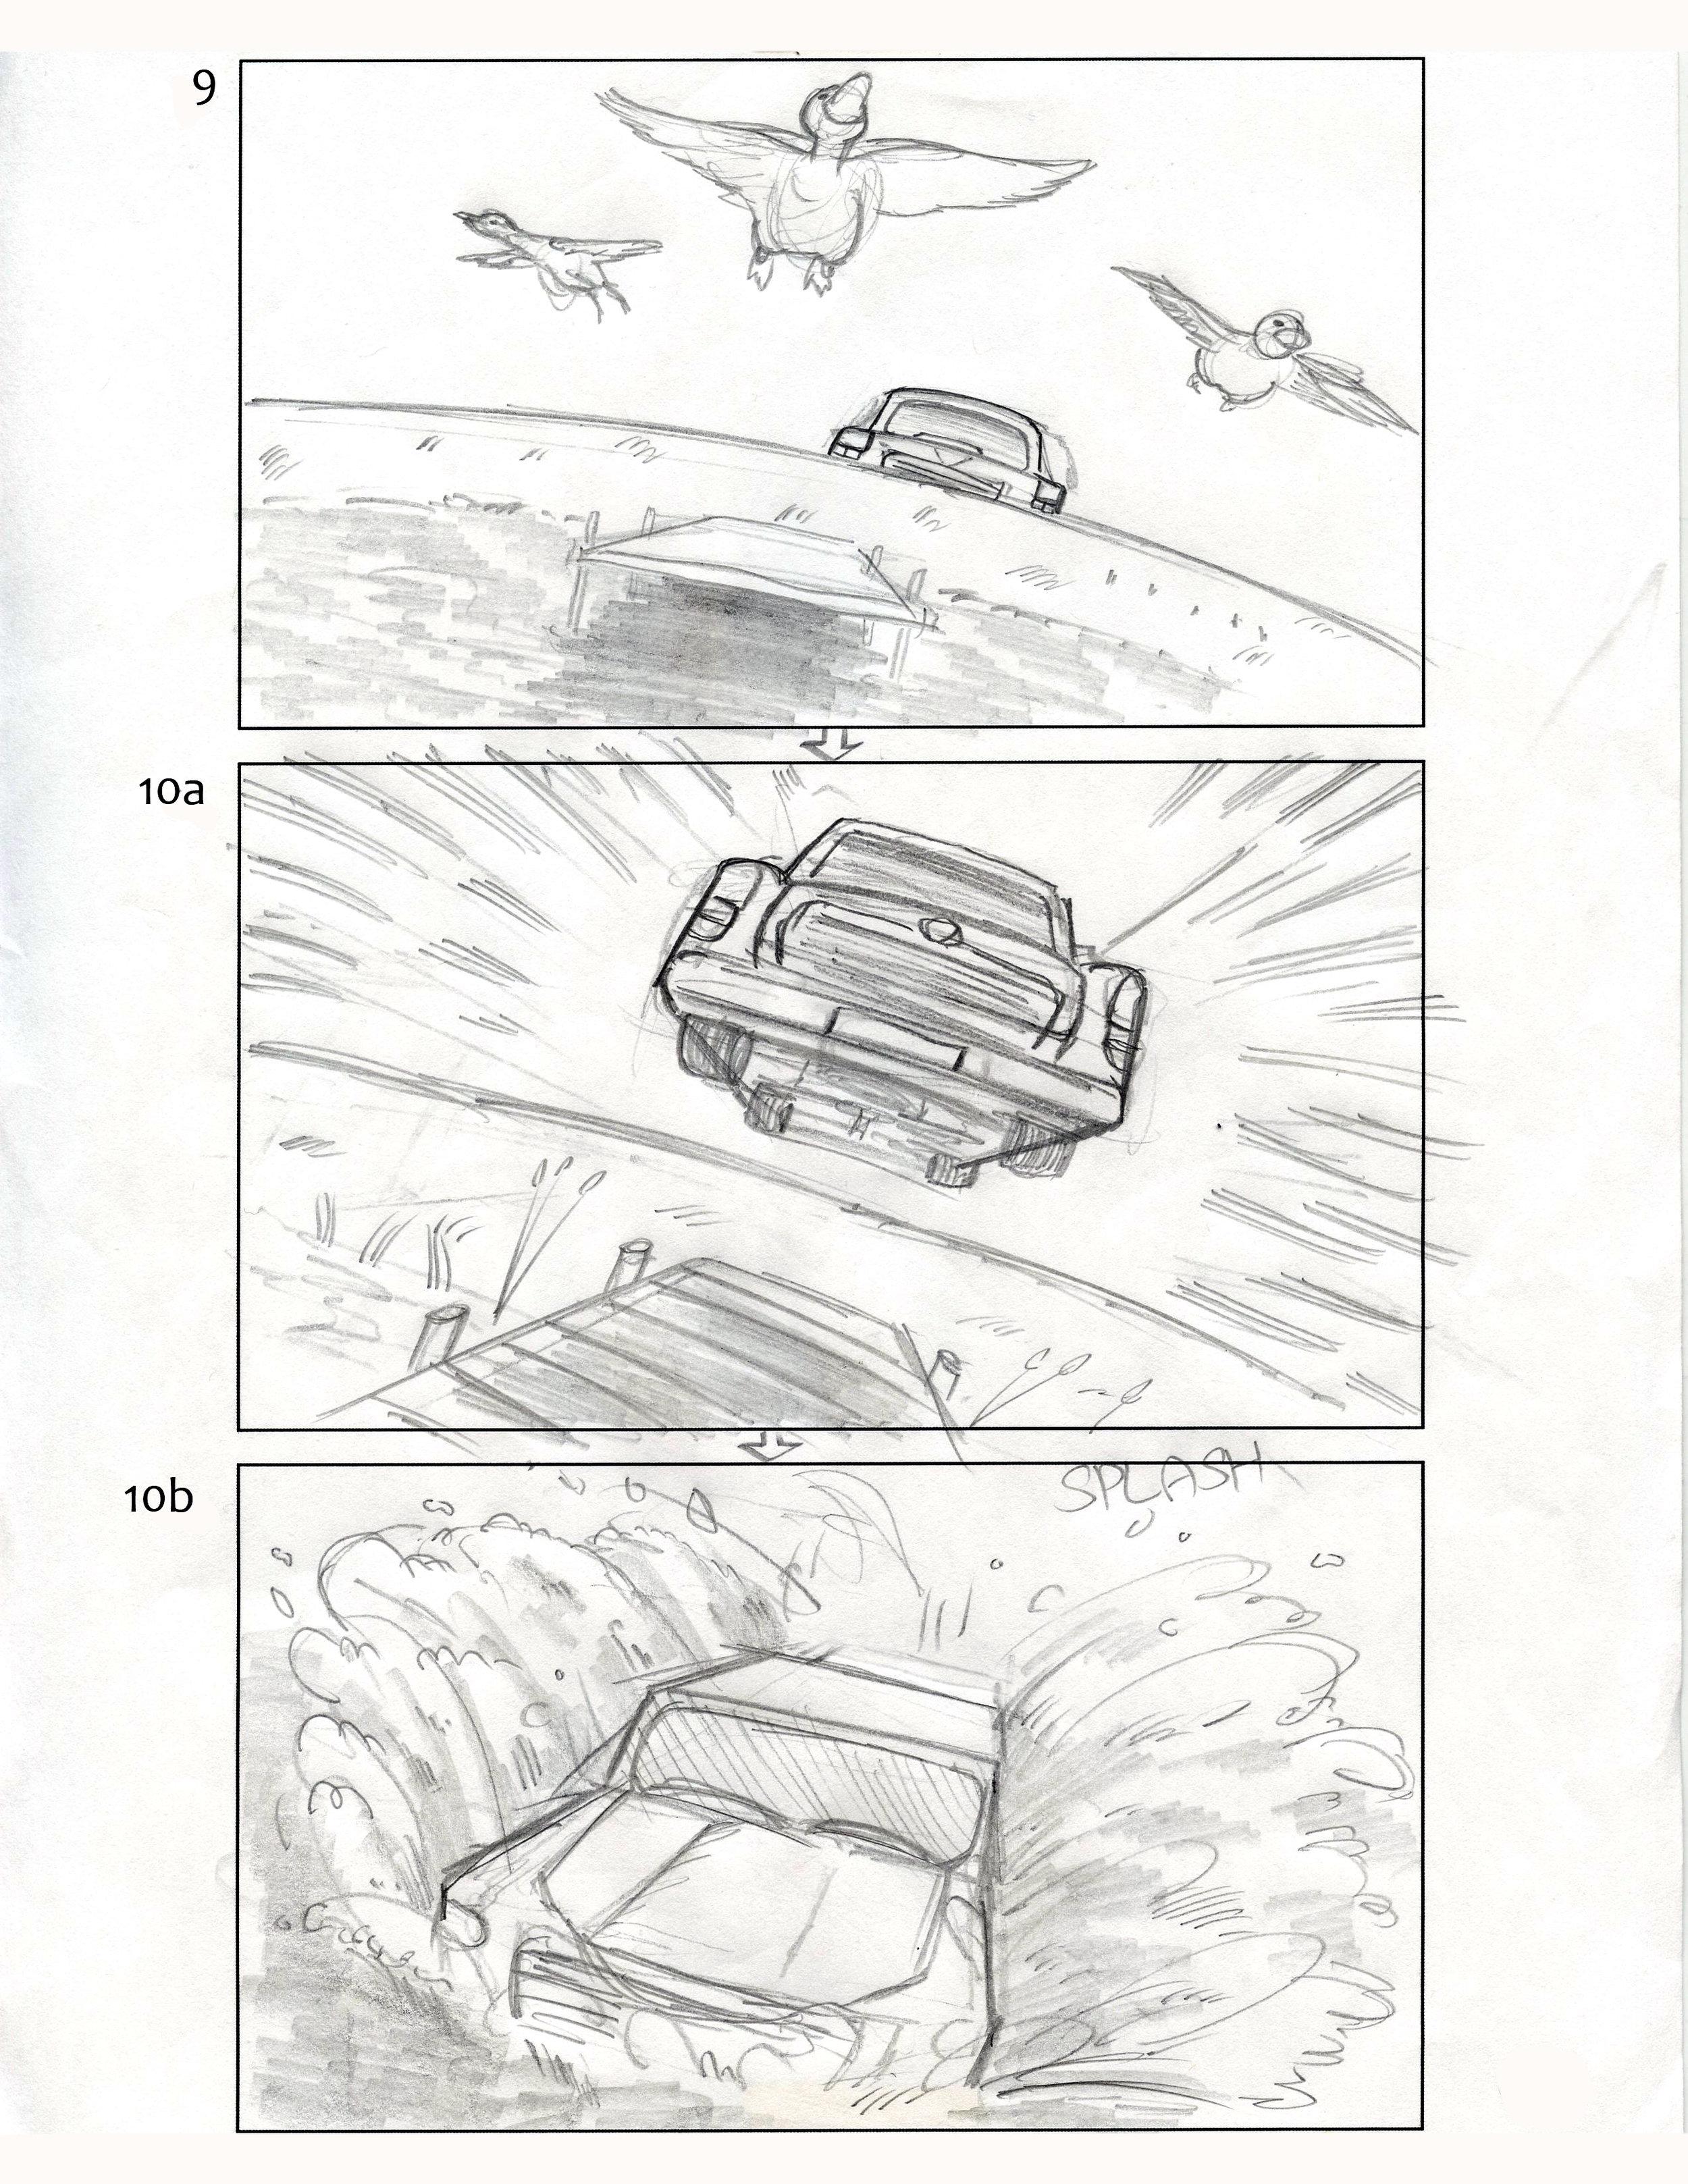 Storyboard2_9-10b.jpg